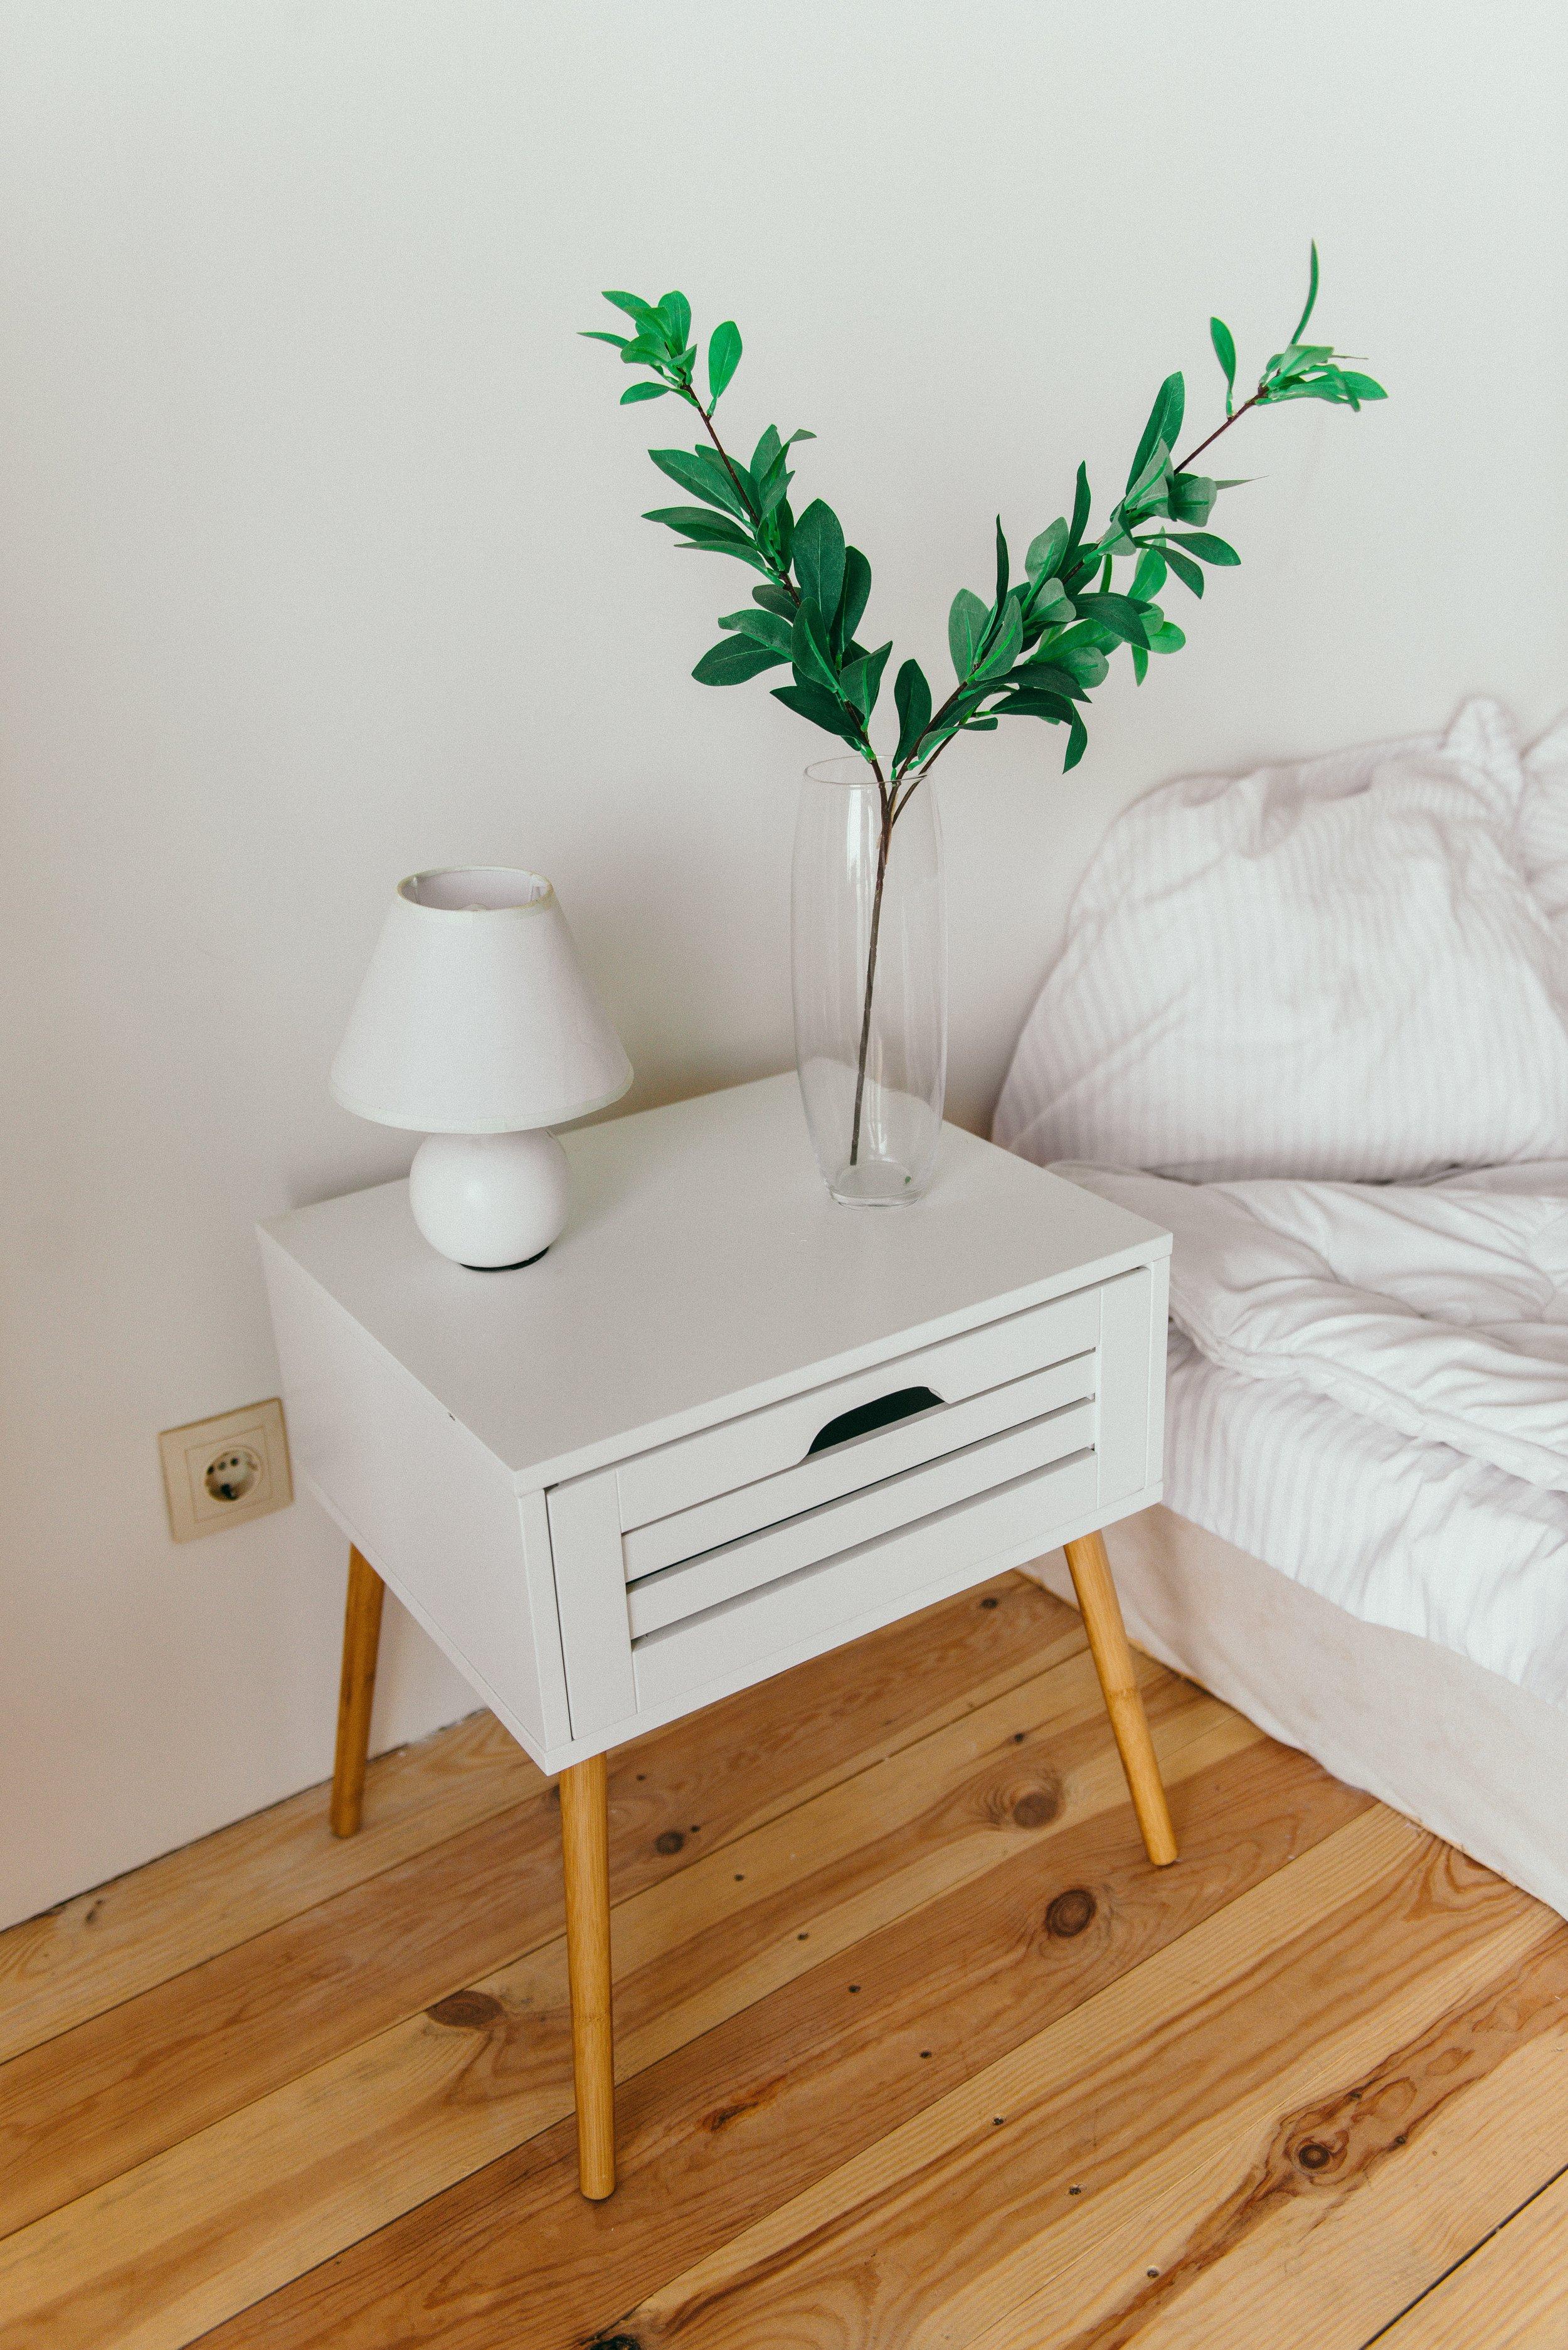 apartment-bed-bedroom-2082092.jpg